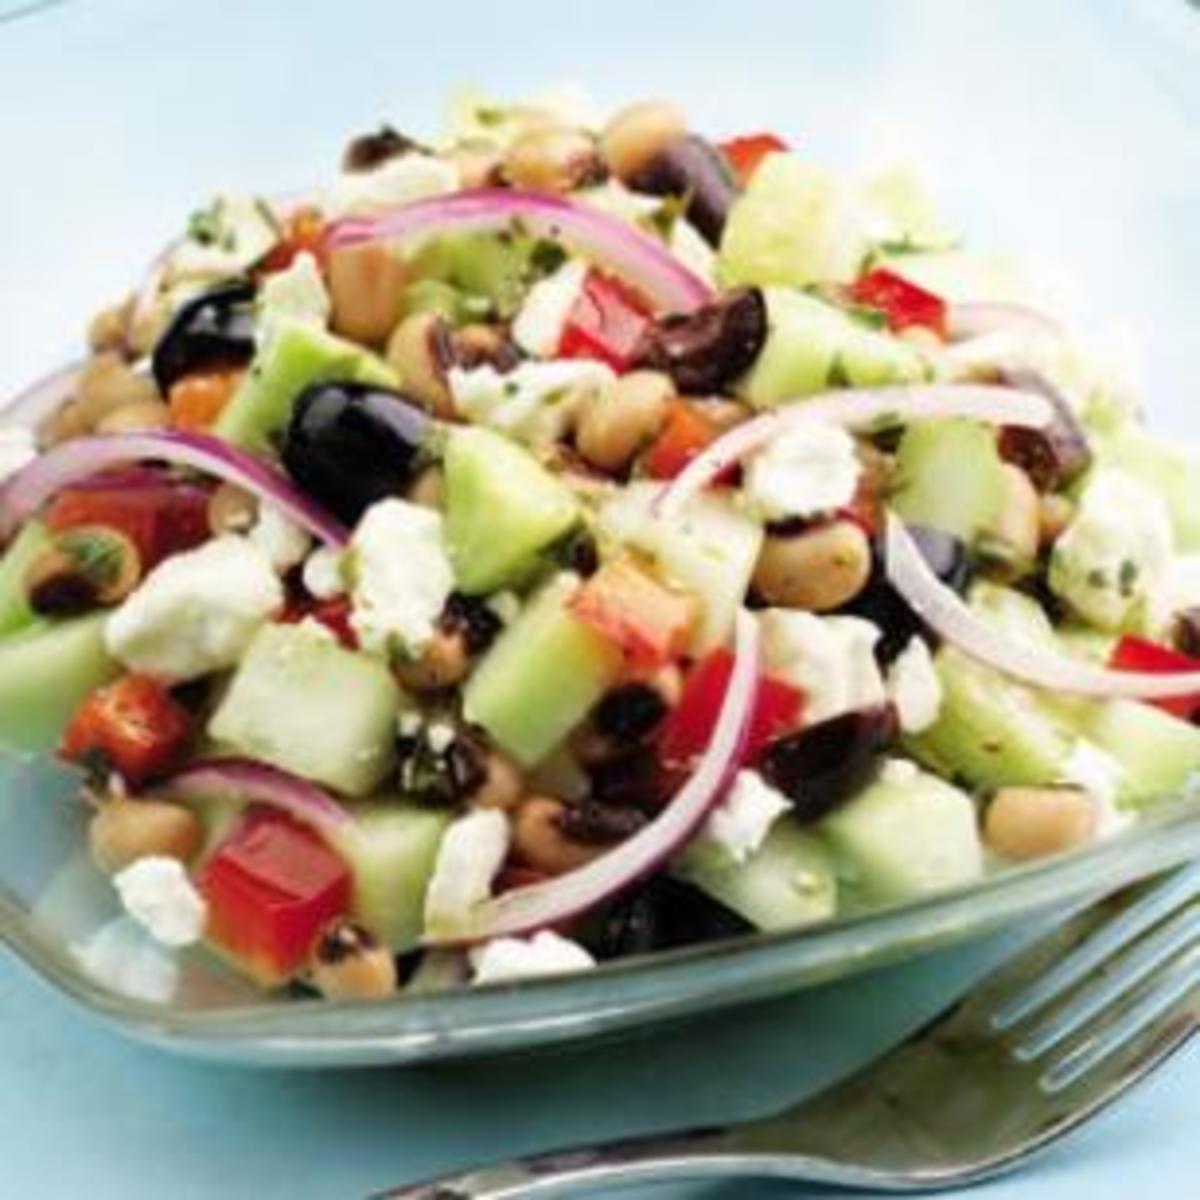 Cucumber-And-Black-Eyed-Pea-Salad